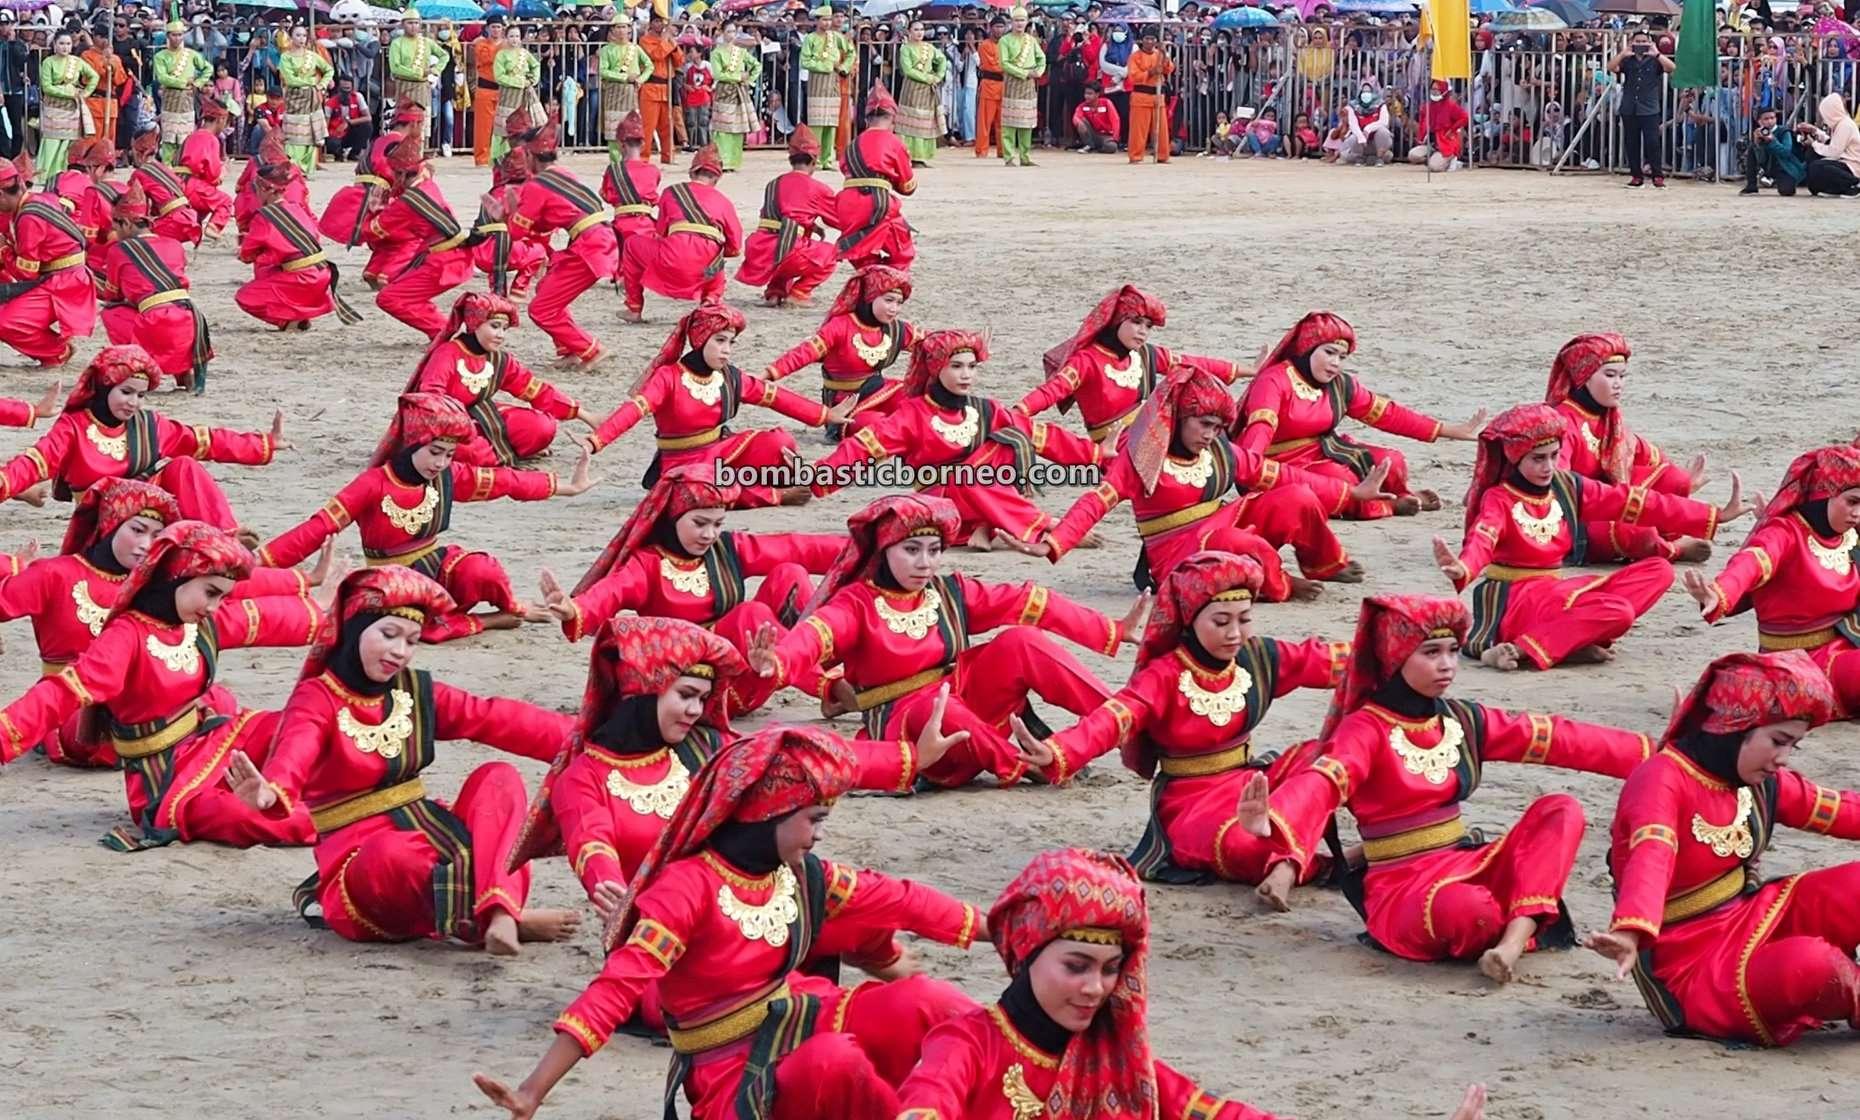 Suku Dayak Tidung, authentic, indigenous, culture, Ethnic, native, tribal, Kalimantan Utara, Pariwisata, Tourism, travel guide, Trans Borneo, 婆罗洲达雅传统文化, 印尼北加里曼丹, 打拉根旅游景点